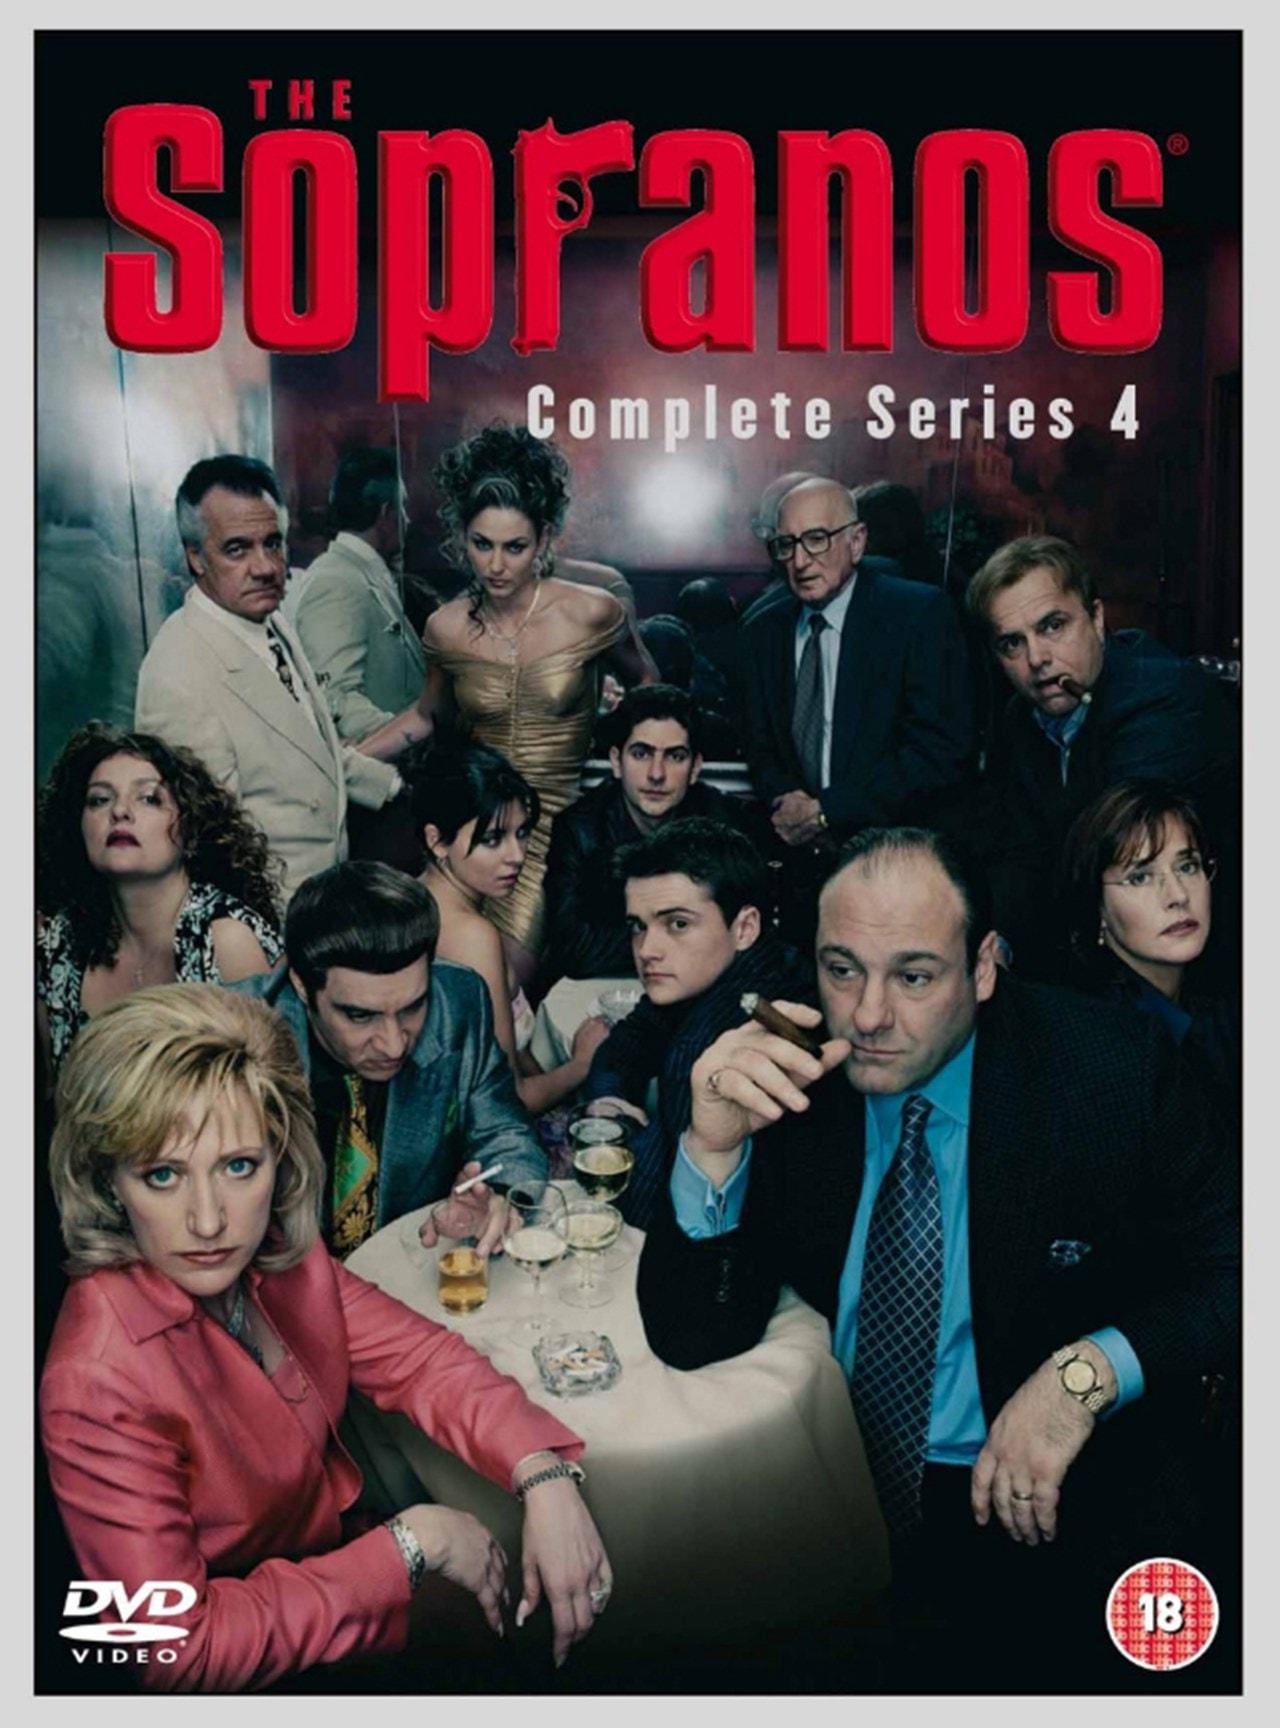 The Sopranos: Complete Series 4 - 1